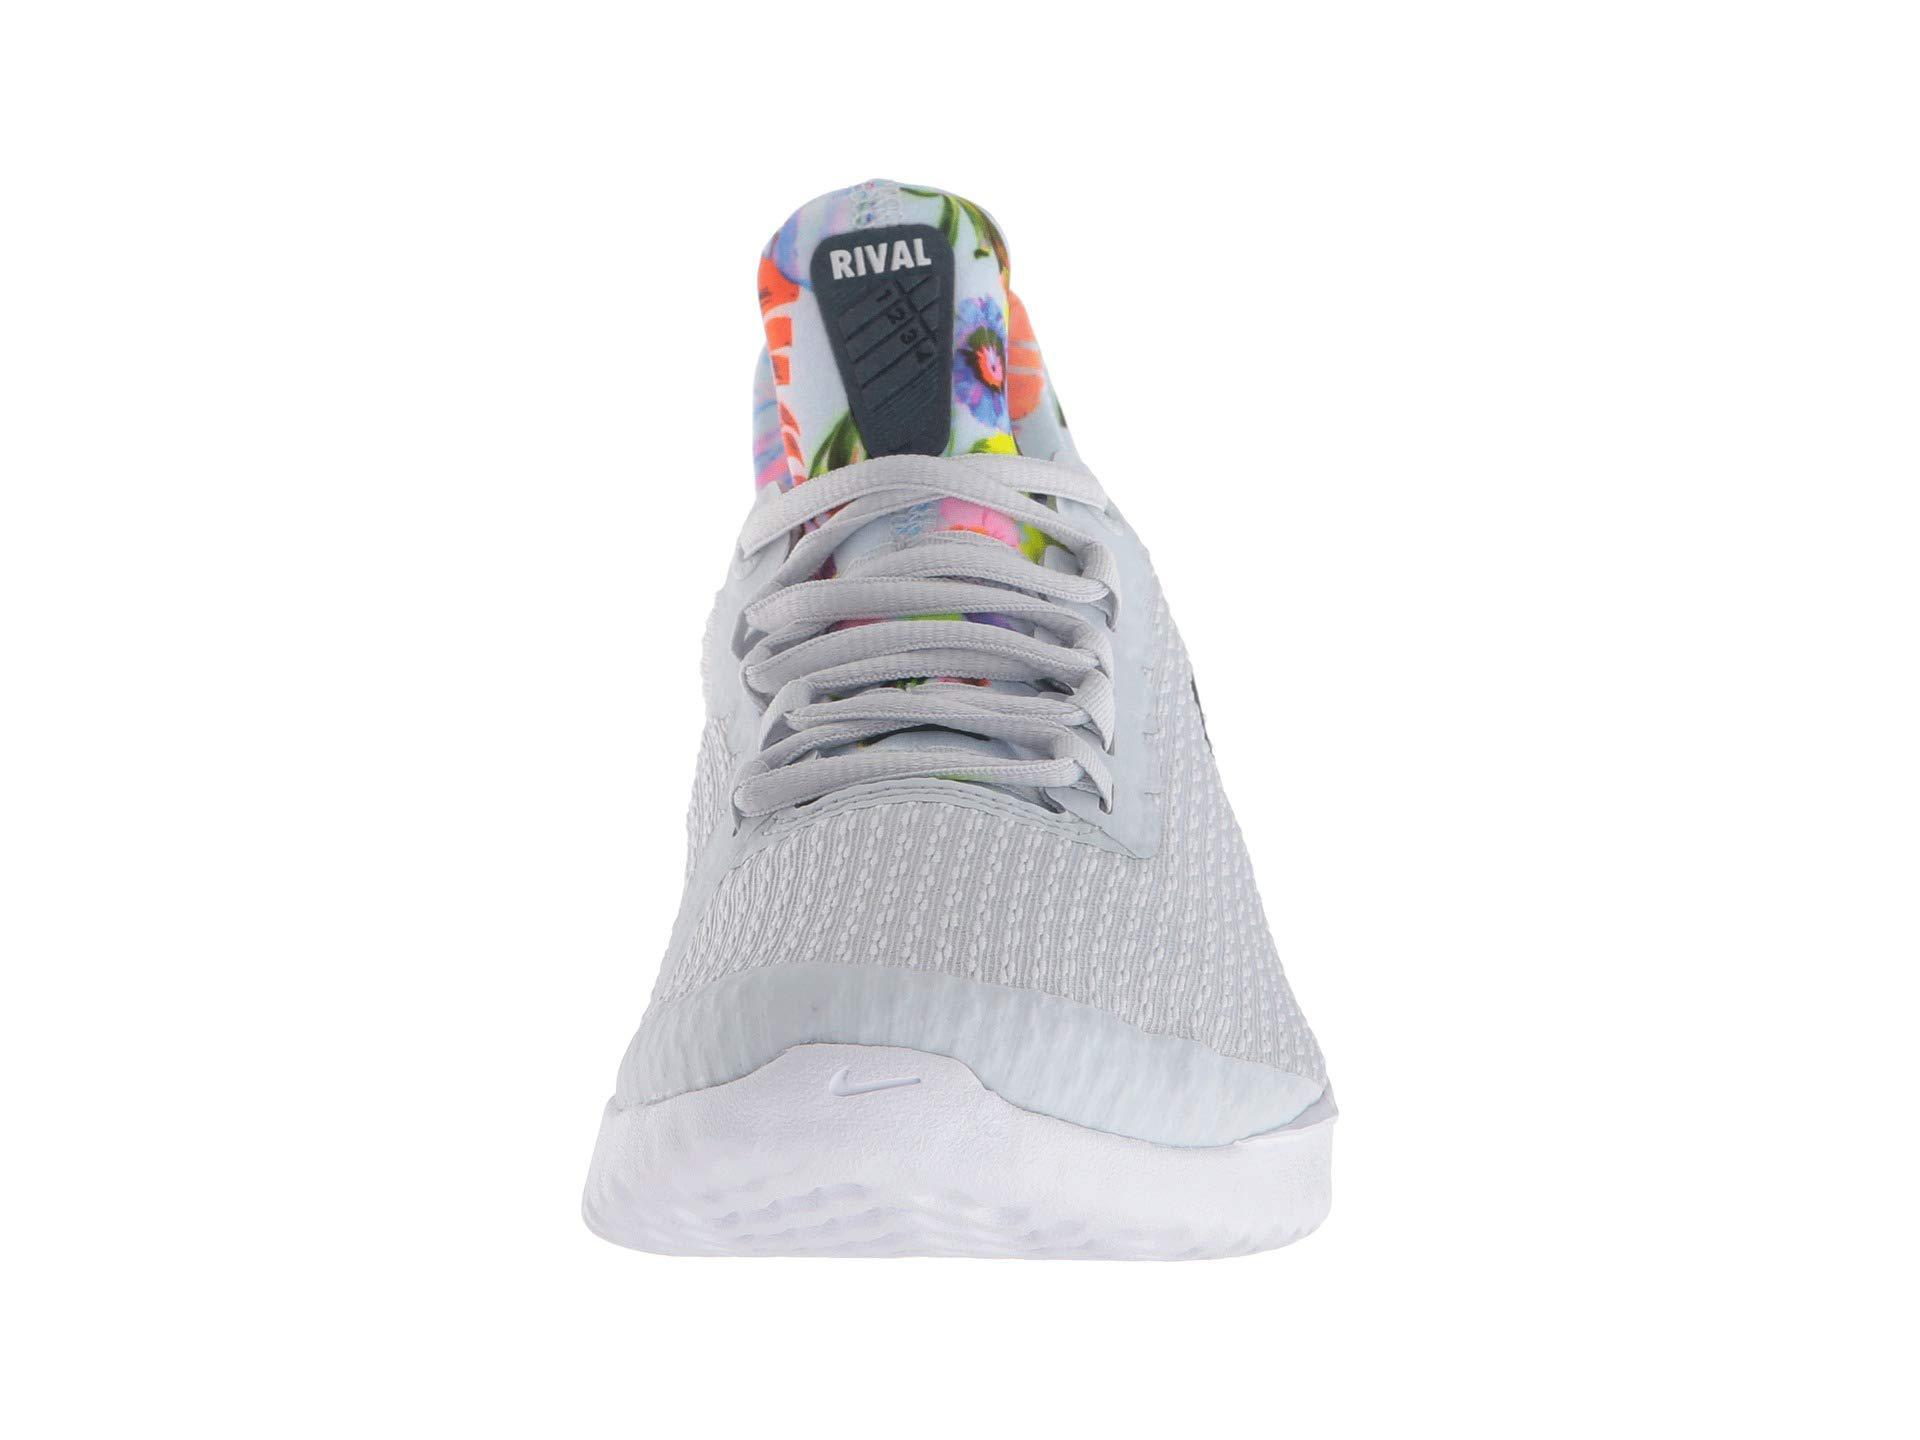 2e3c25cf0b7 Lyst - Nike Renew Rival Premium (pure Platinum black multicolor ...